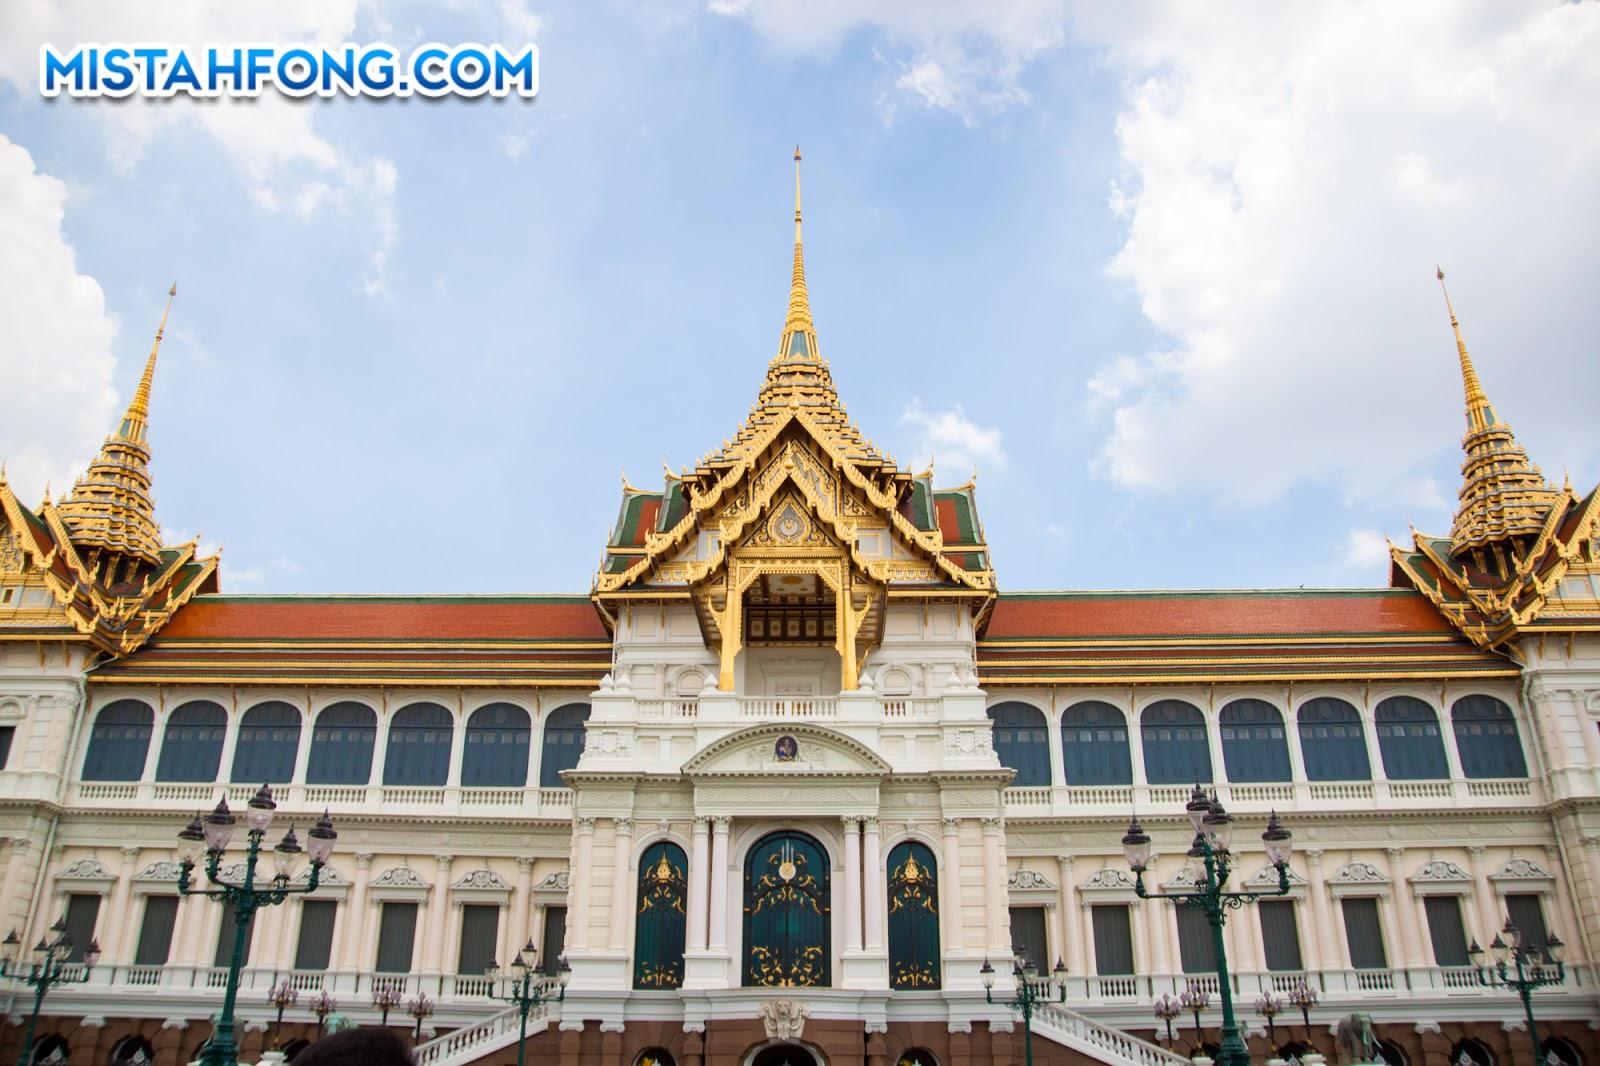 Phra Thinang Chakri Maha Prasat พระที่นั่งจักรีมหาปราสาท